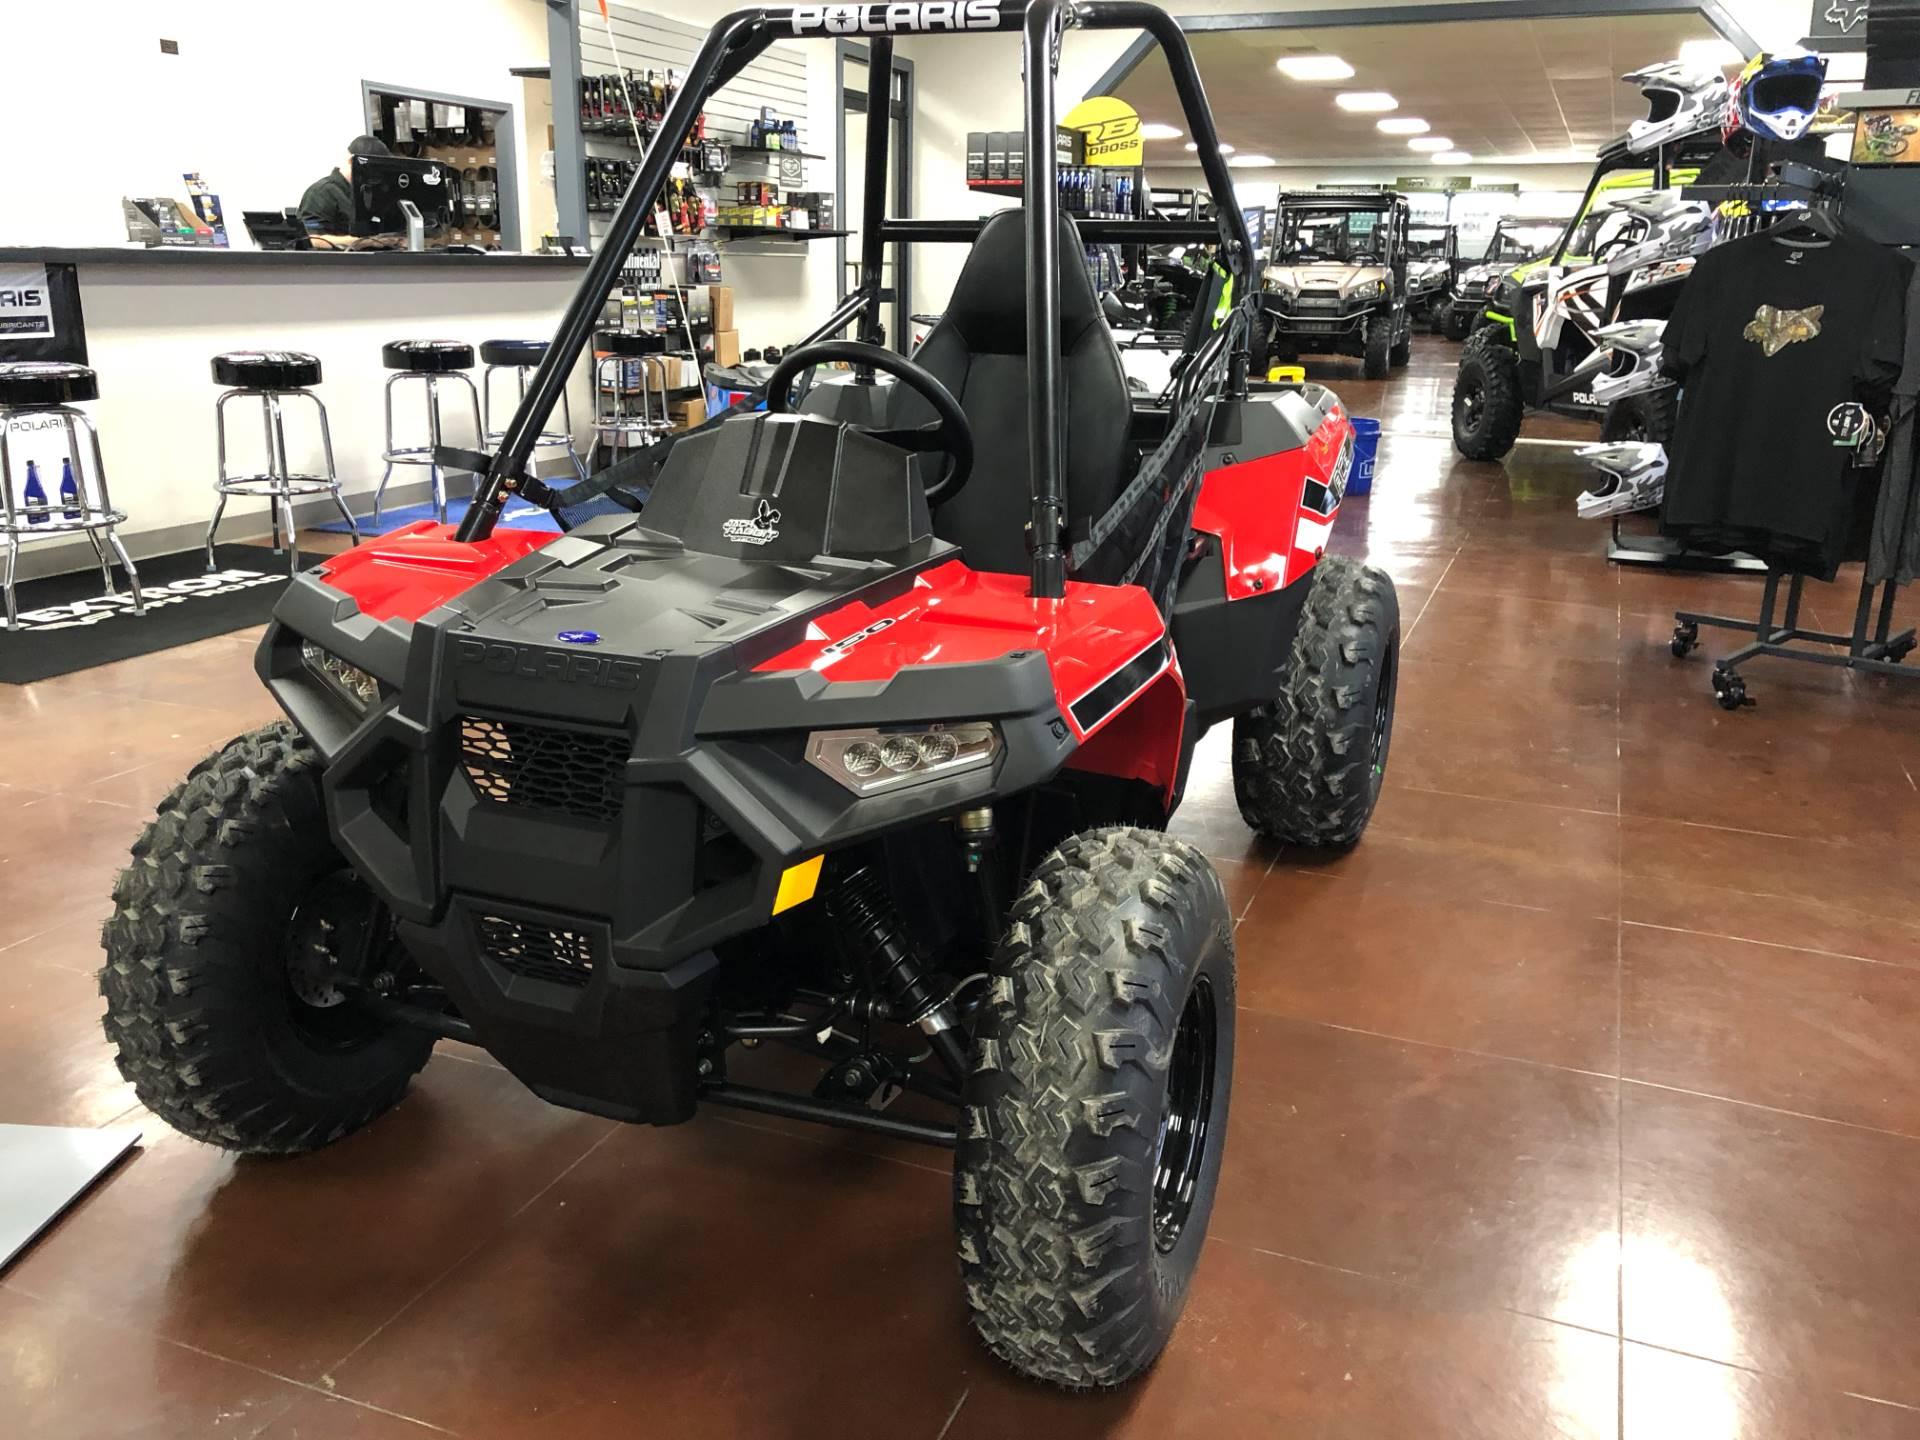 2018 Polaris Ace 150 EFI for sale 239616